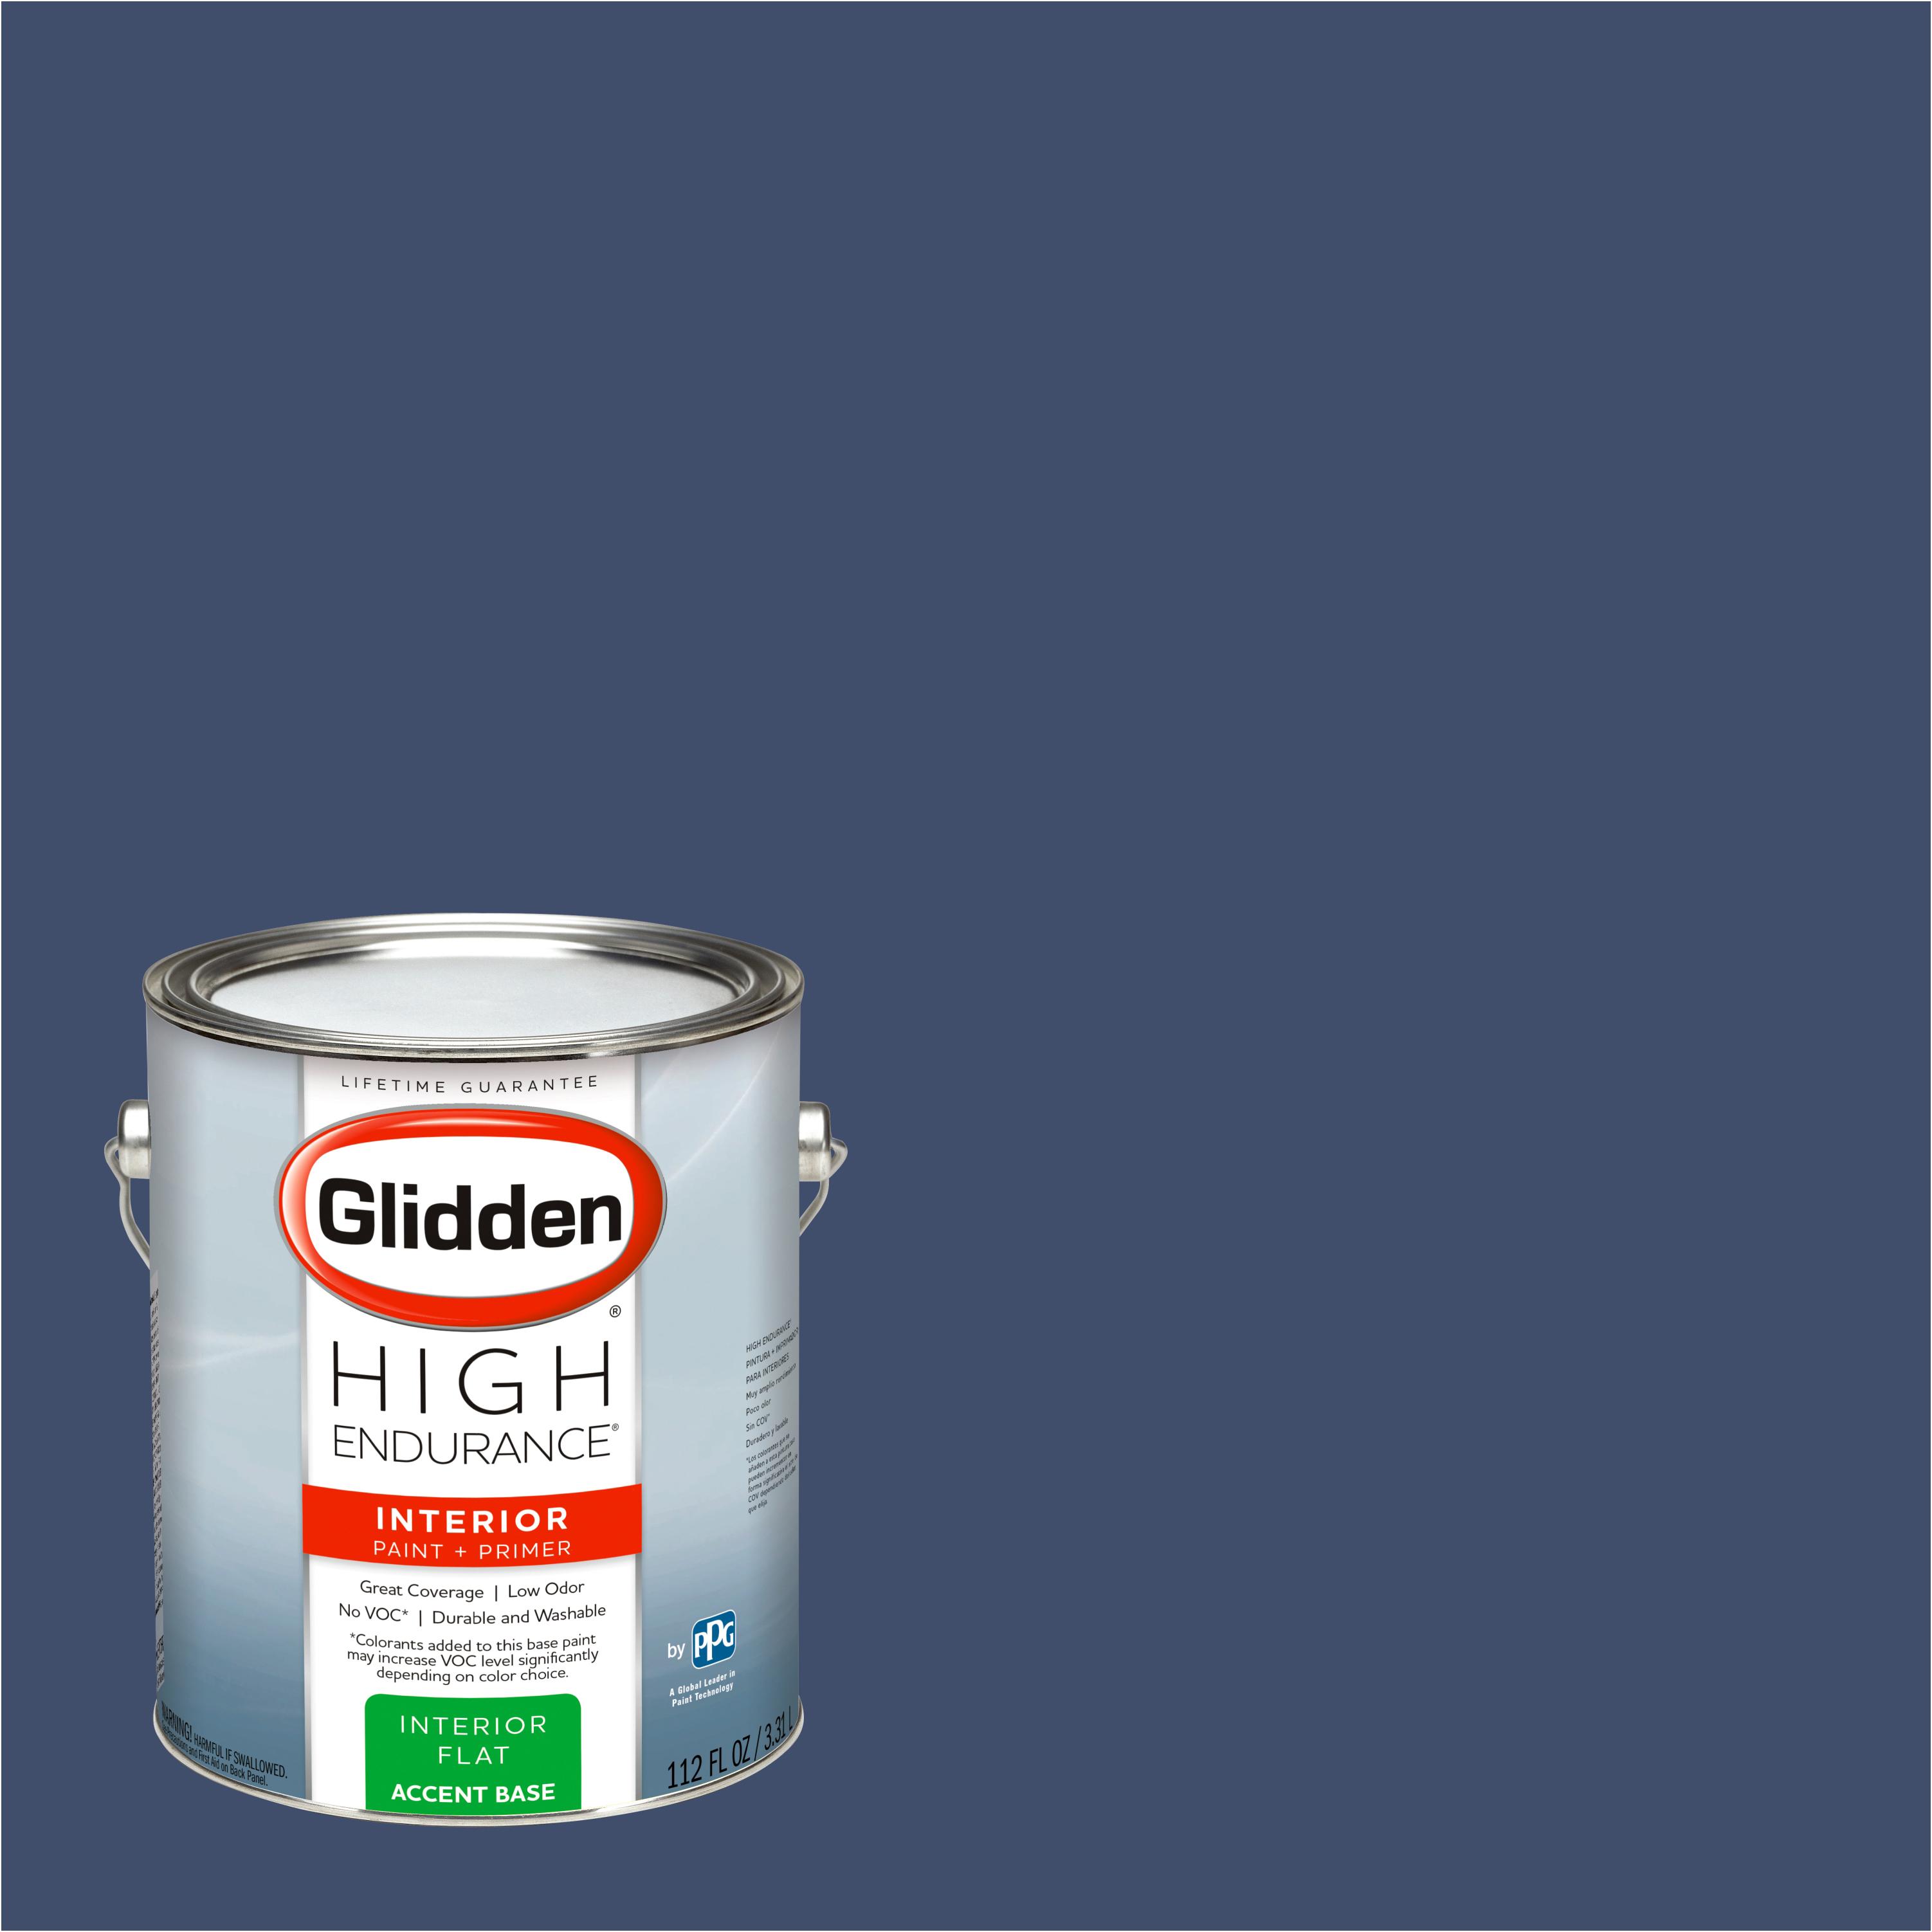 Glidden High Endurance, Interior Paint and Primer, Rich Navy, #50BB 08/171